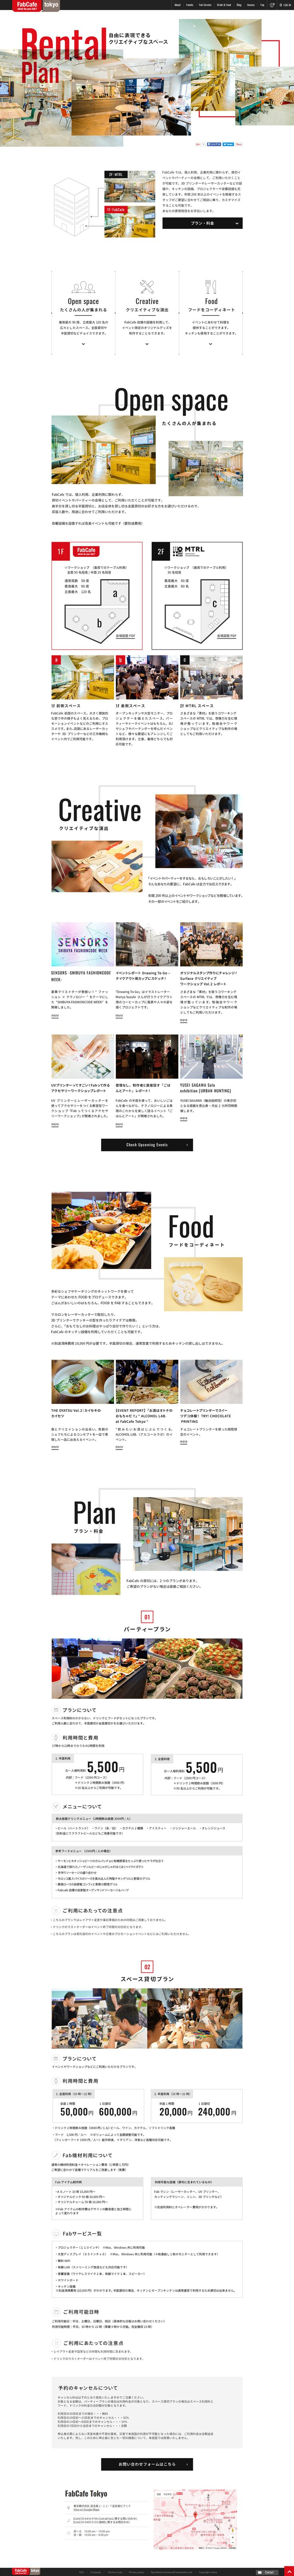 FabCafe tokyo  #LP #ランディングページデザイン  #Webデザイン #Design